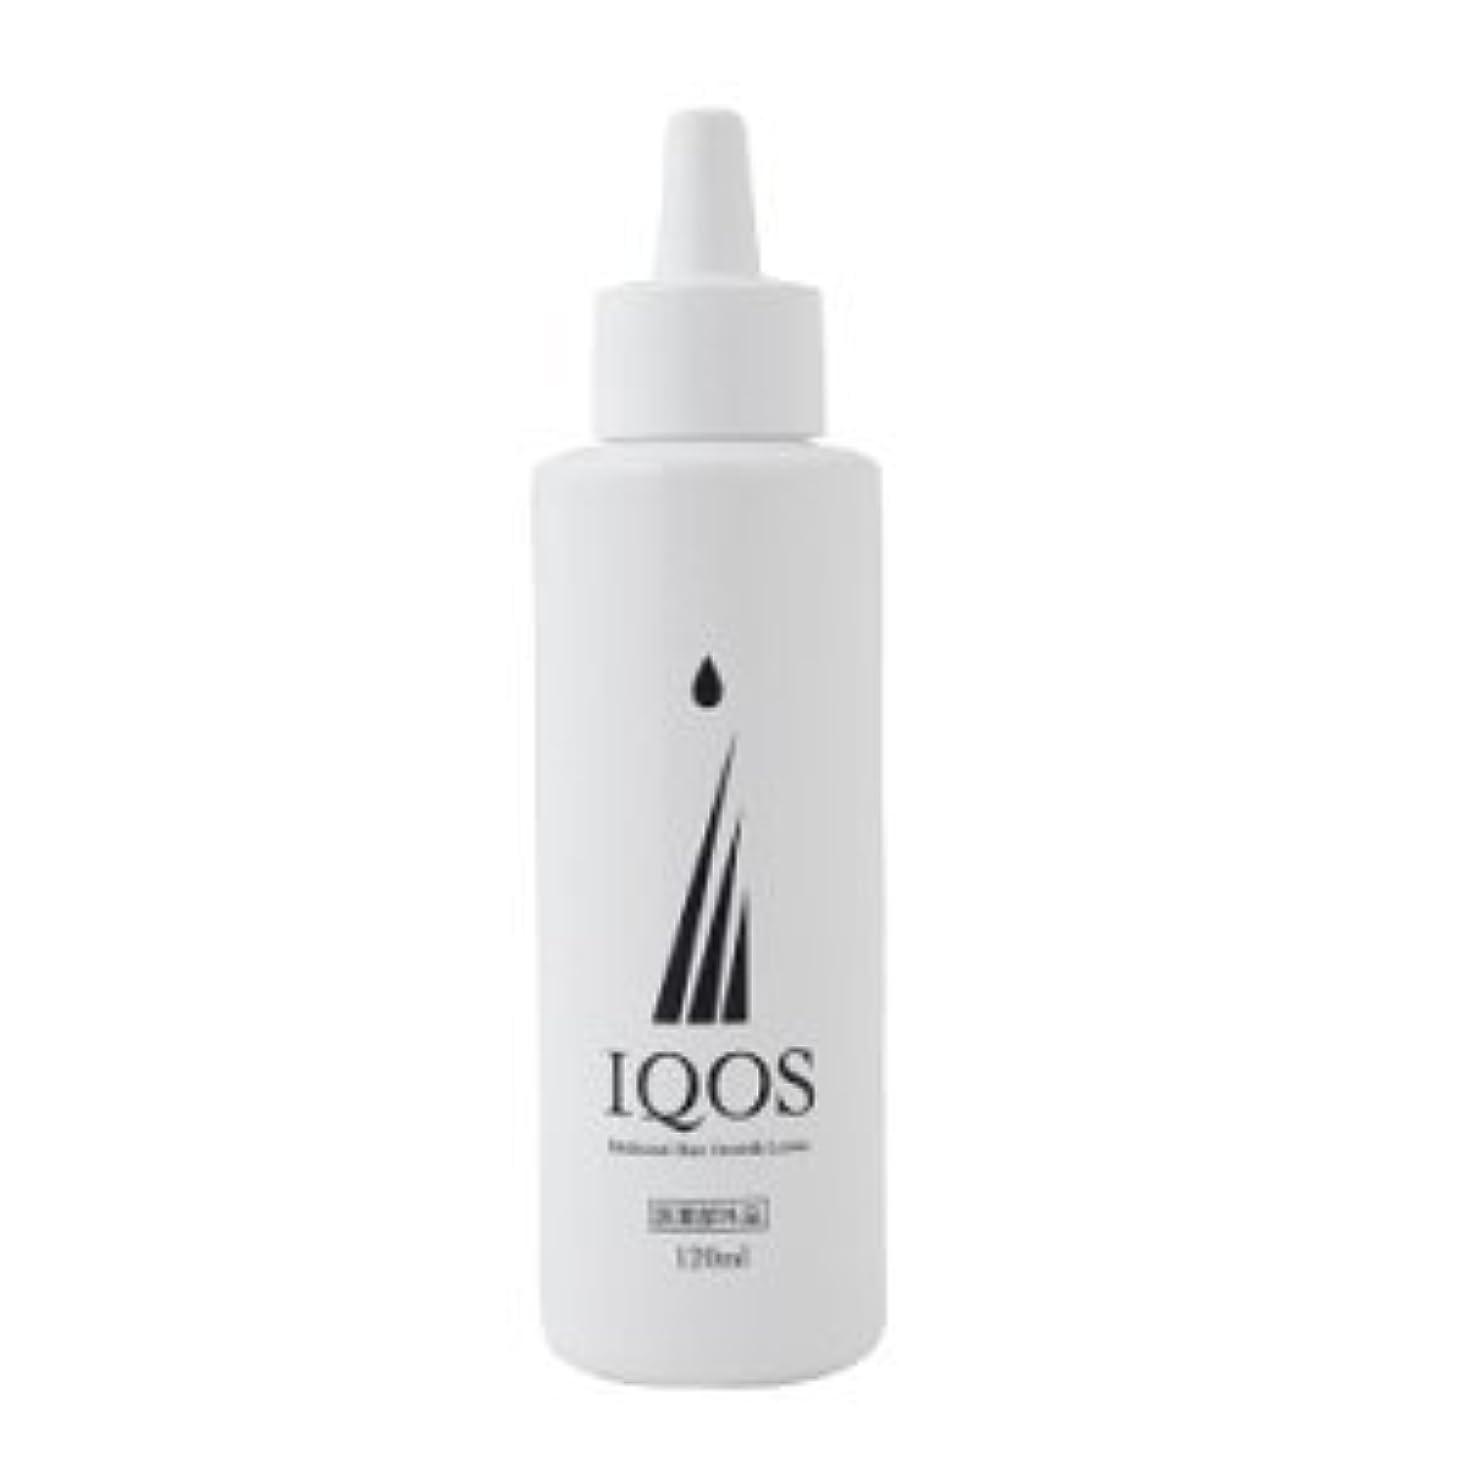 M-034を最大級配合 薬用育毛剤 IQOS イクオス 120ml